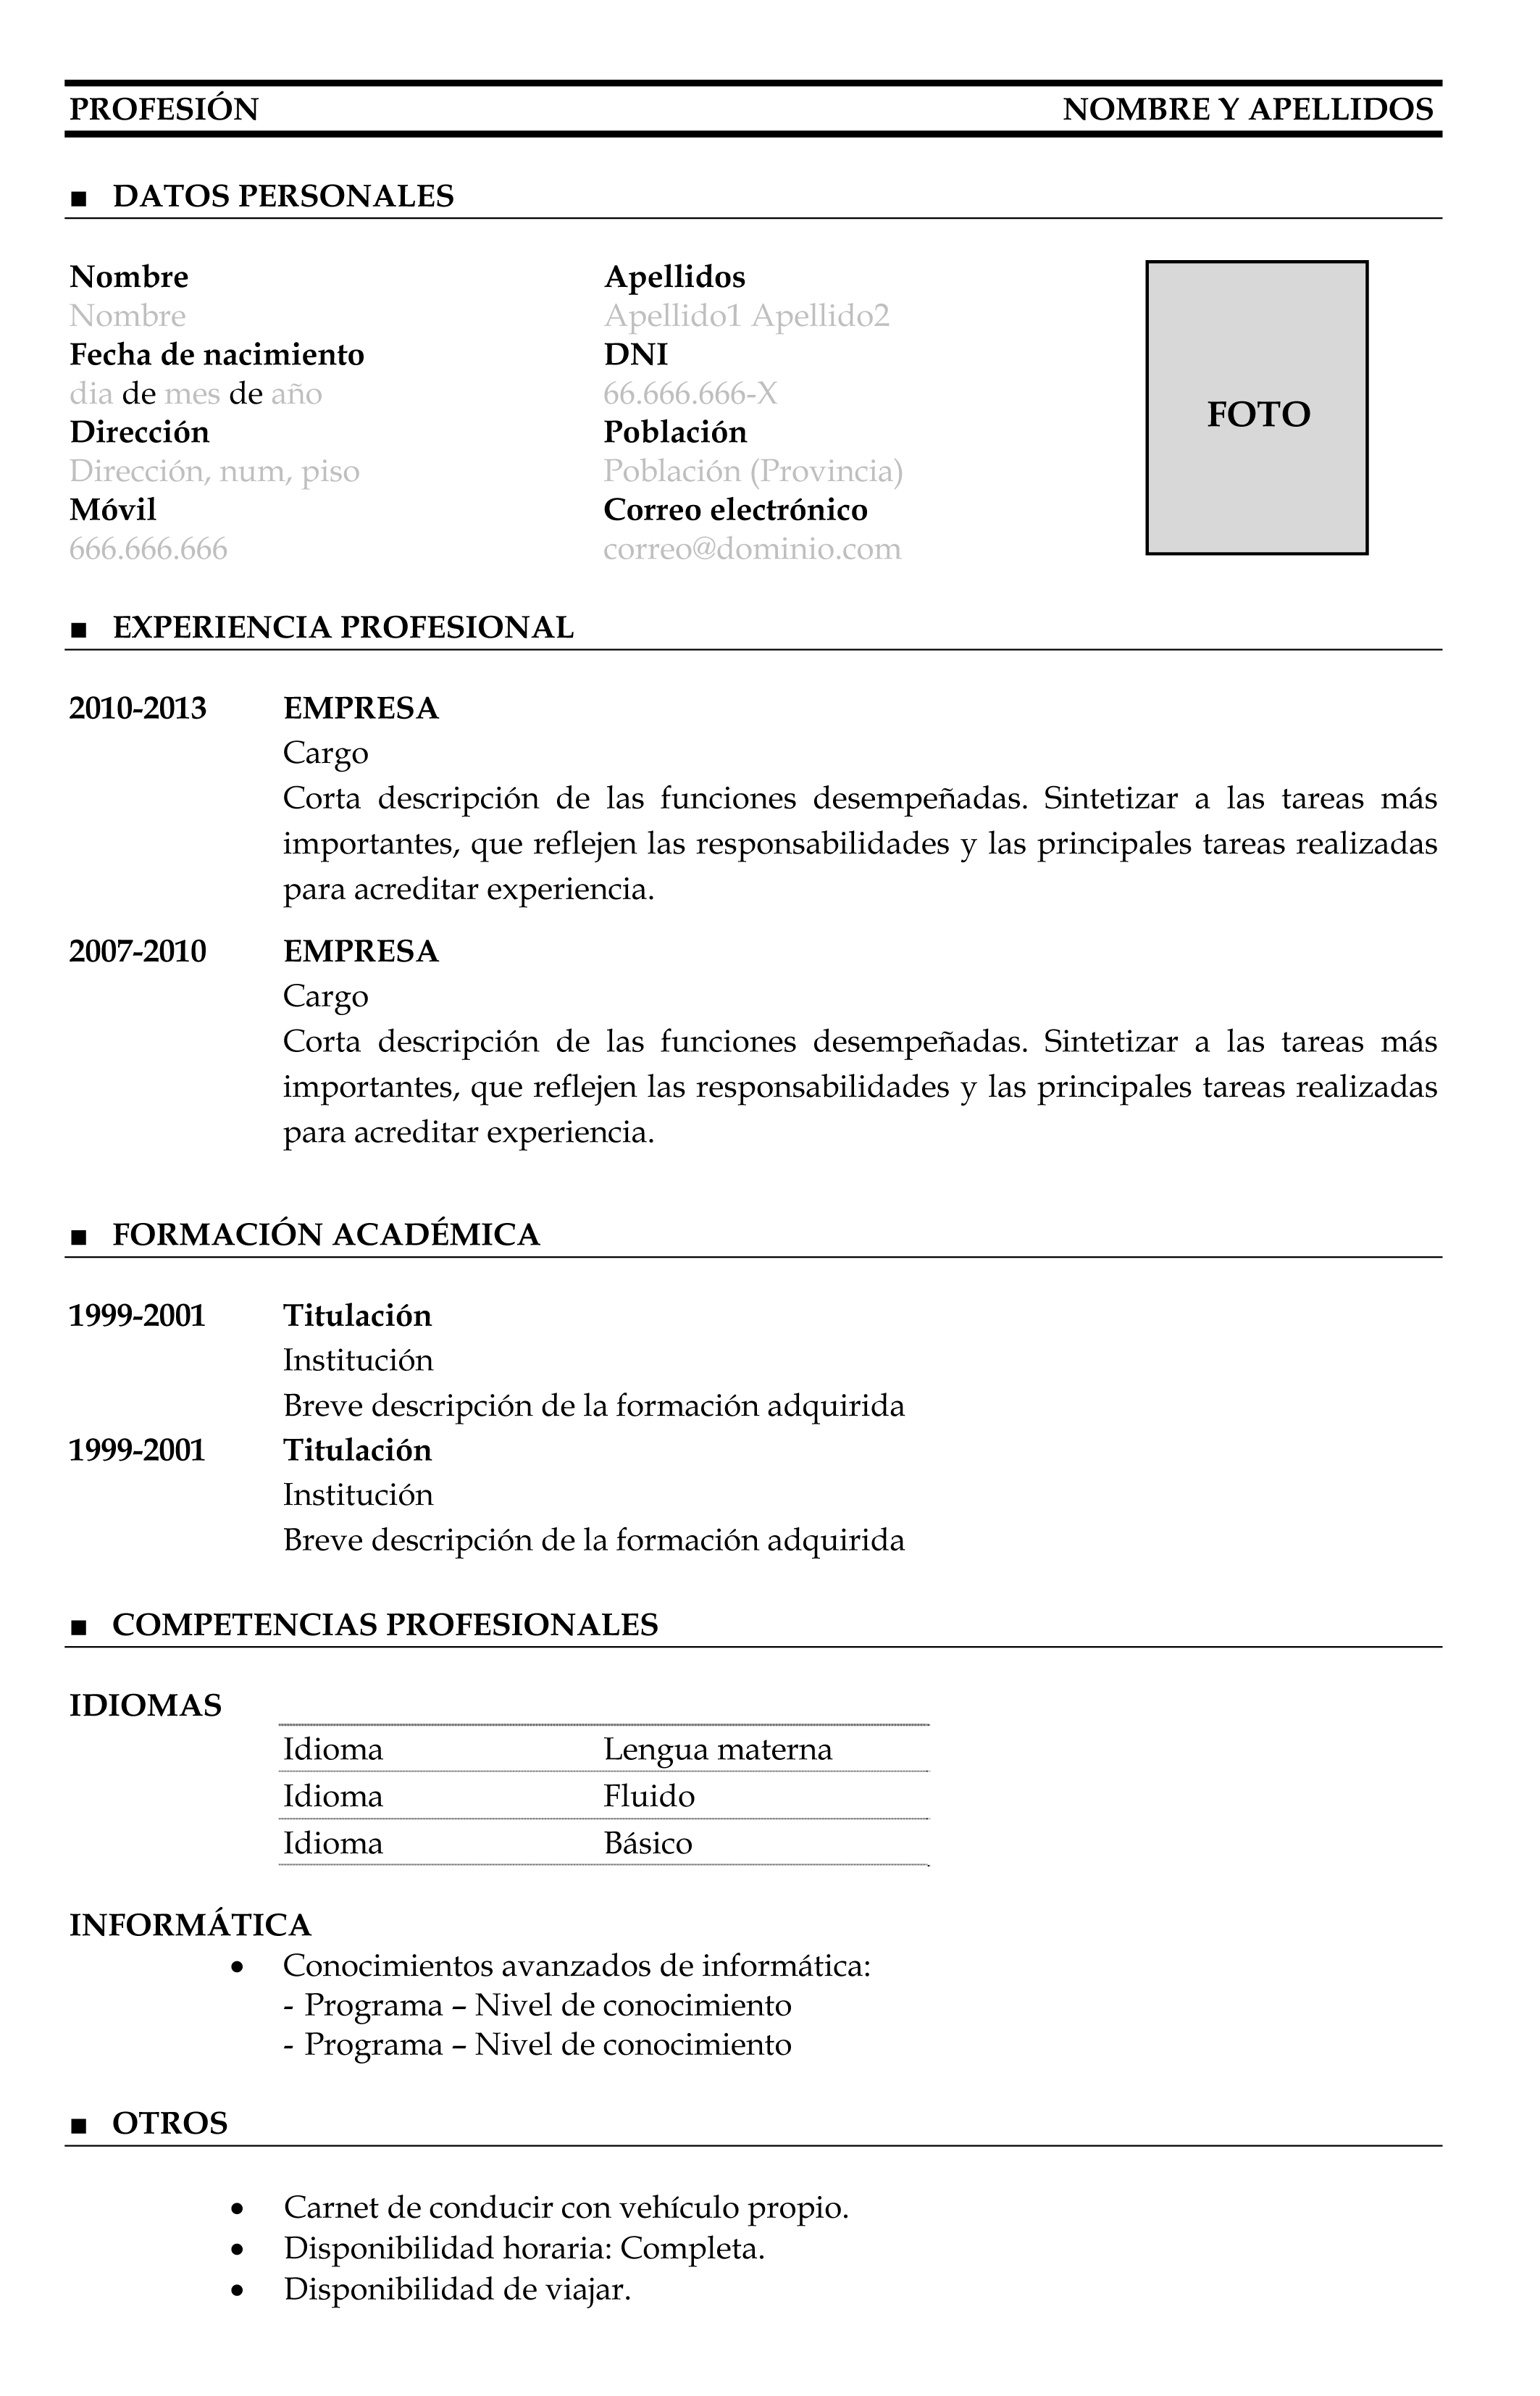 Formato Curriculum Vitae Para Personas Sin Experiencia Laboral